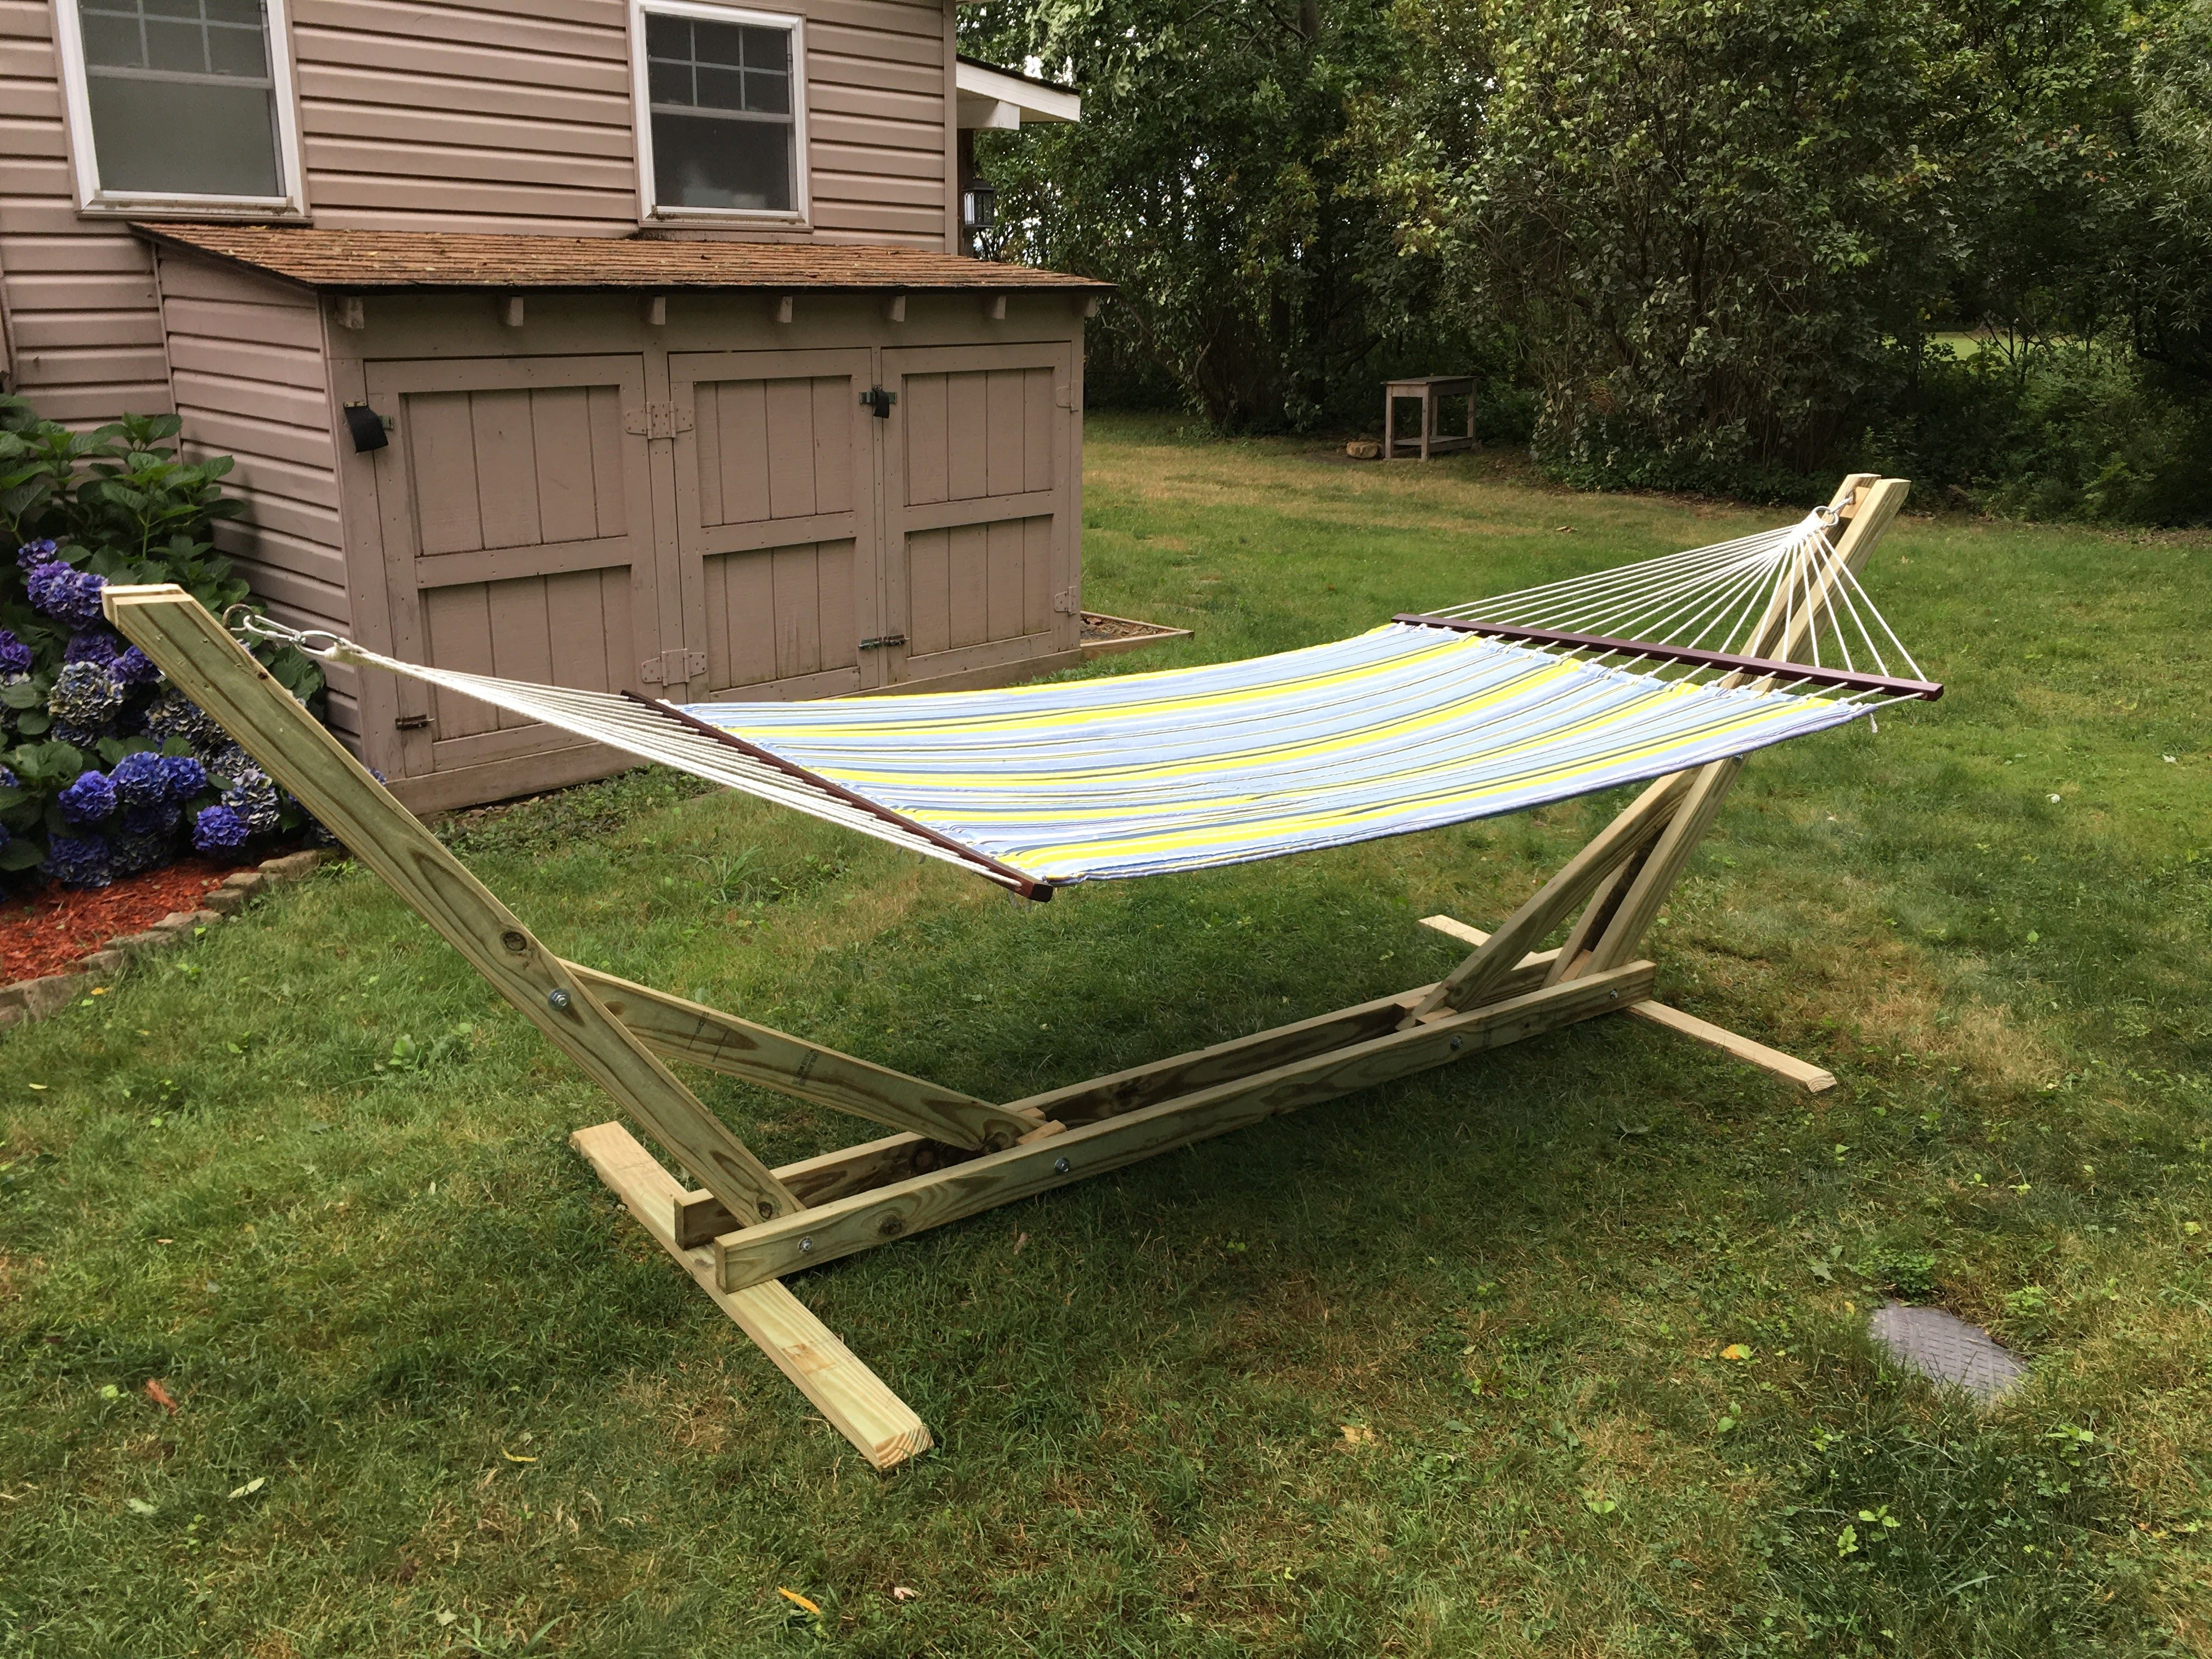 home hammock cheap stand for depot target chair nz s diy stands sale wooden australia